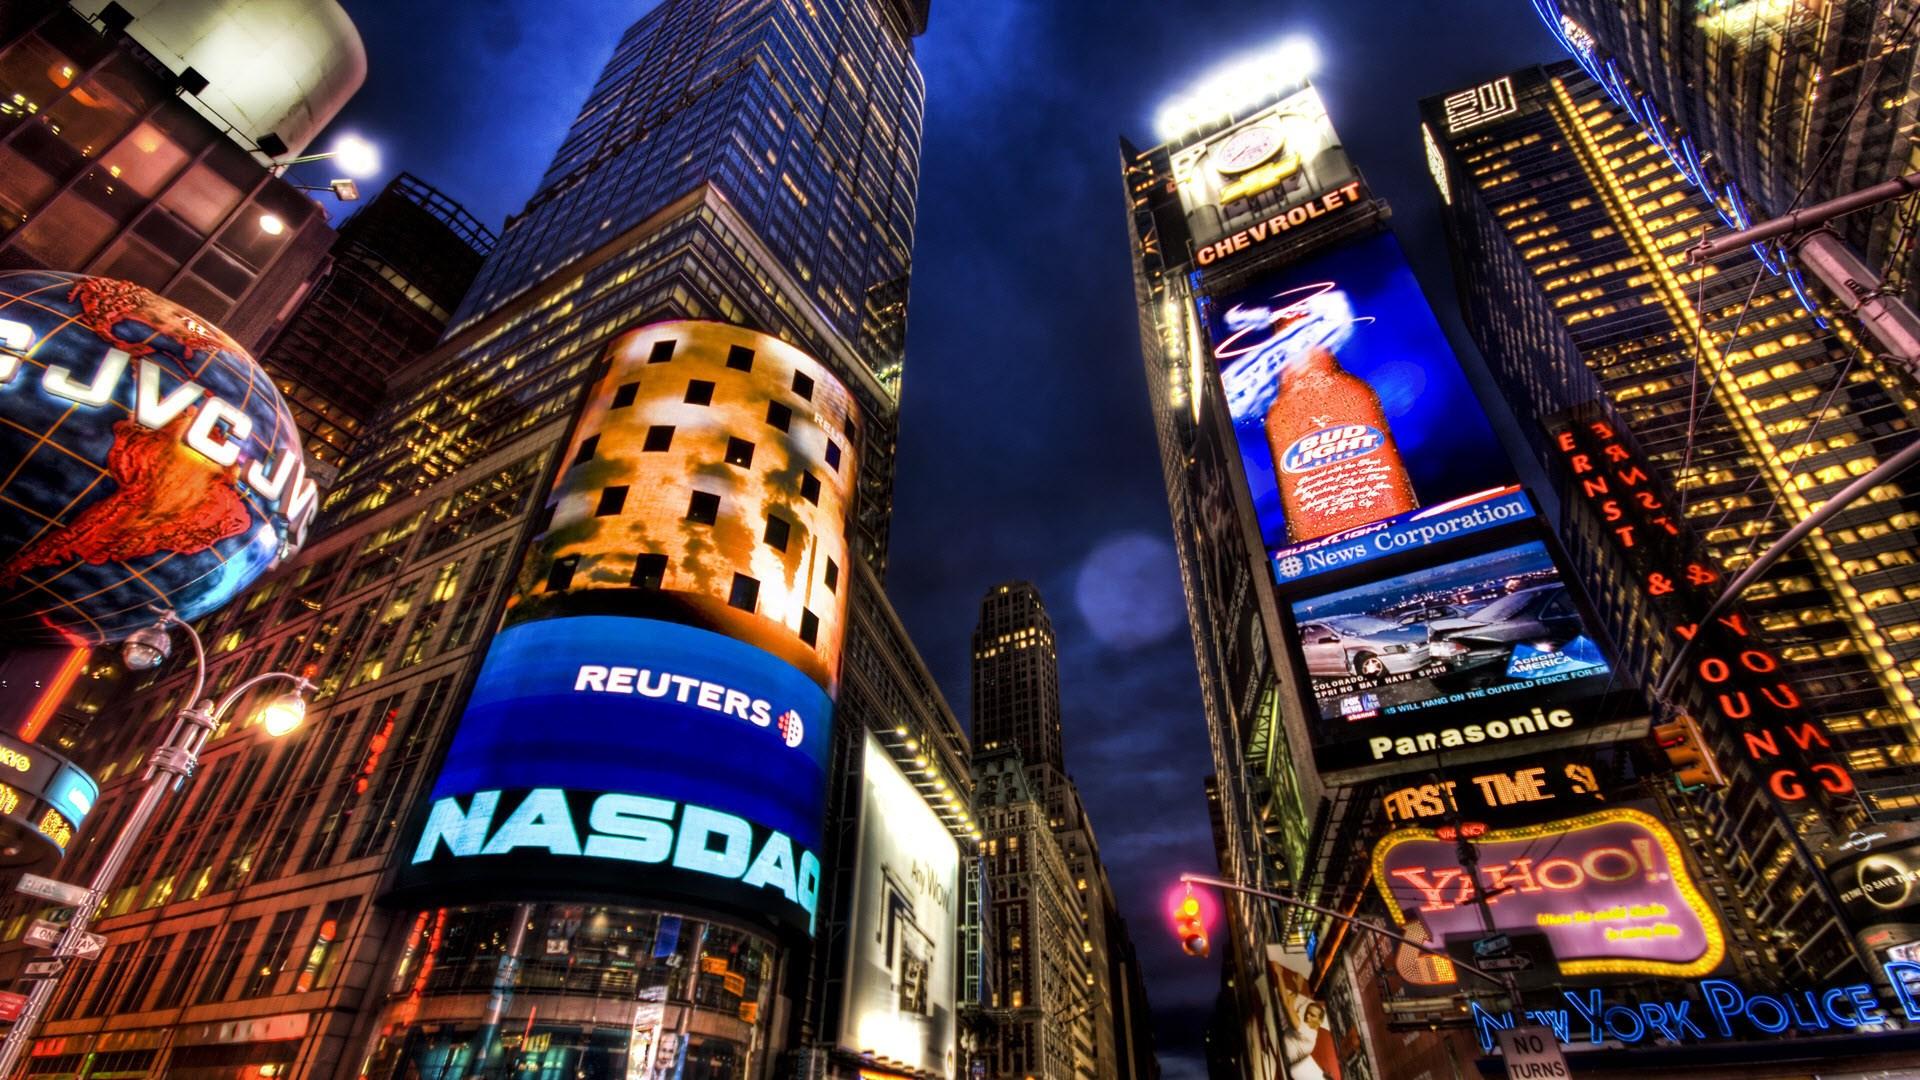 NASDAQ Stock Market New York Wallpaper [1920x1080] 1920x1080